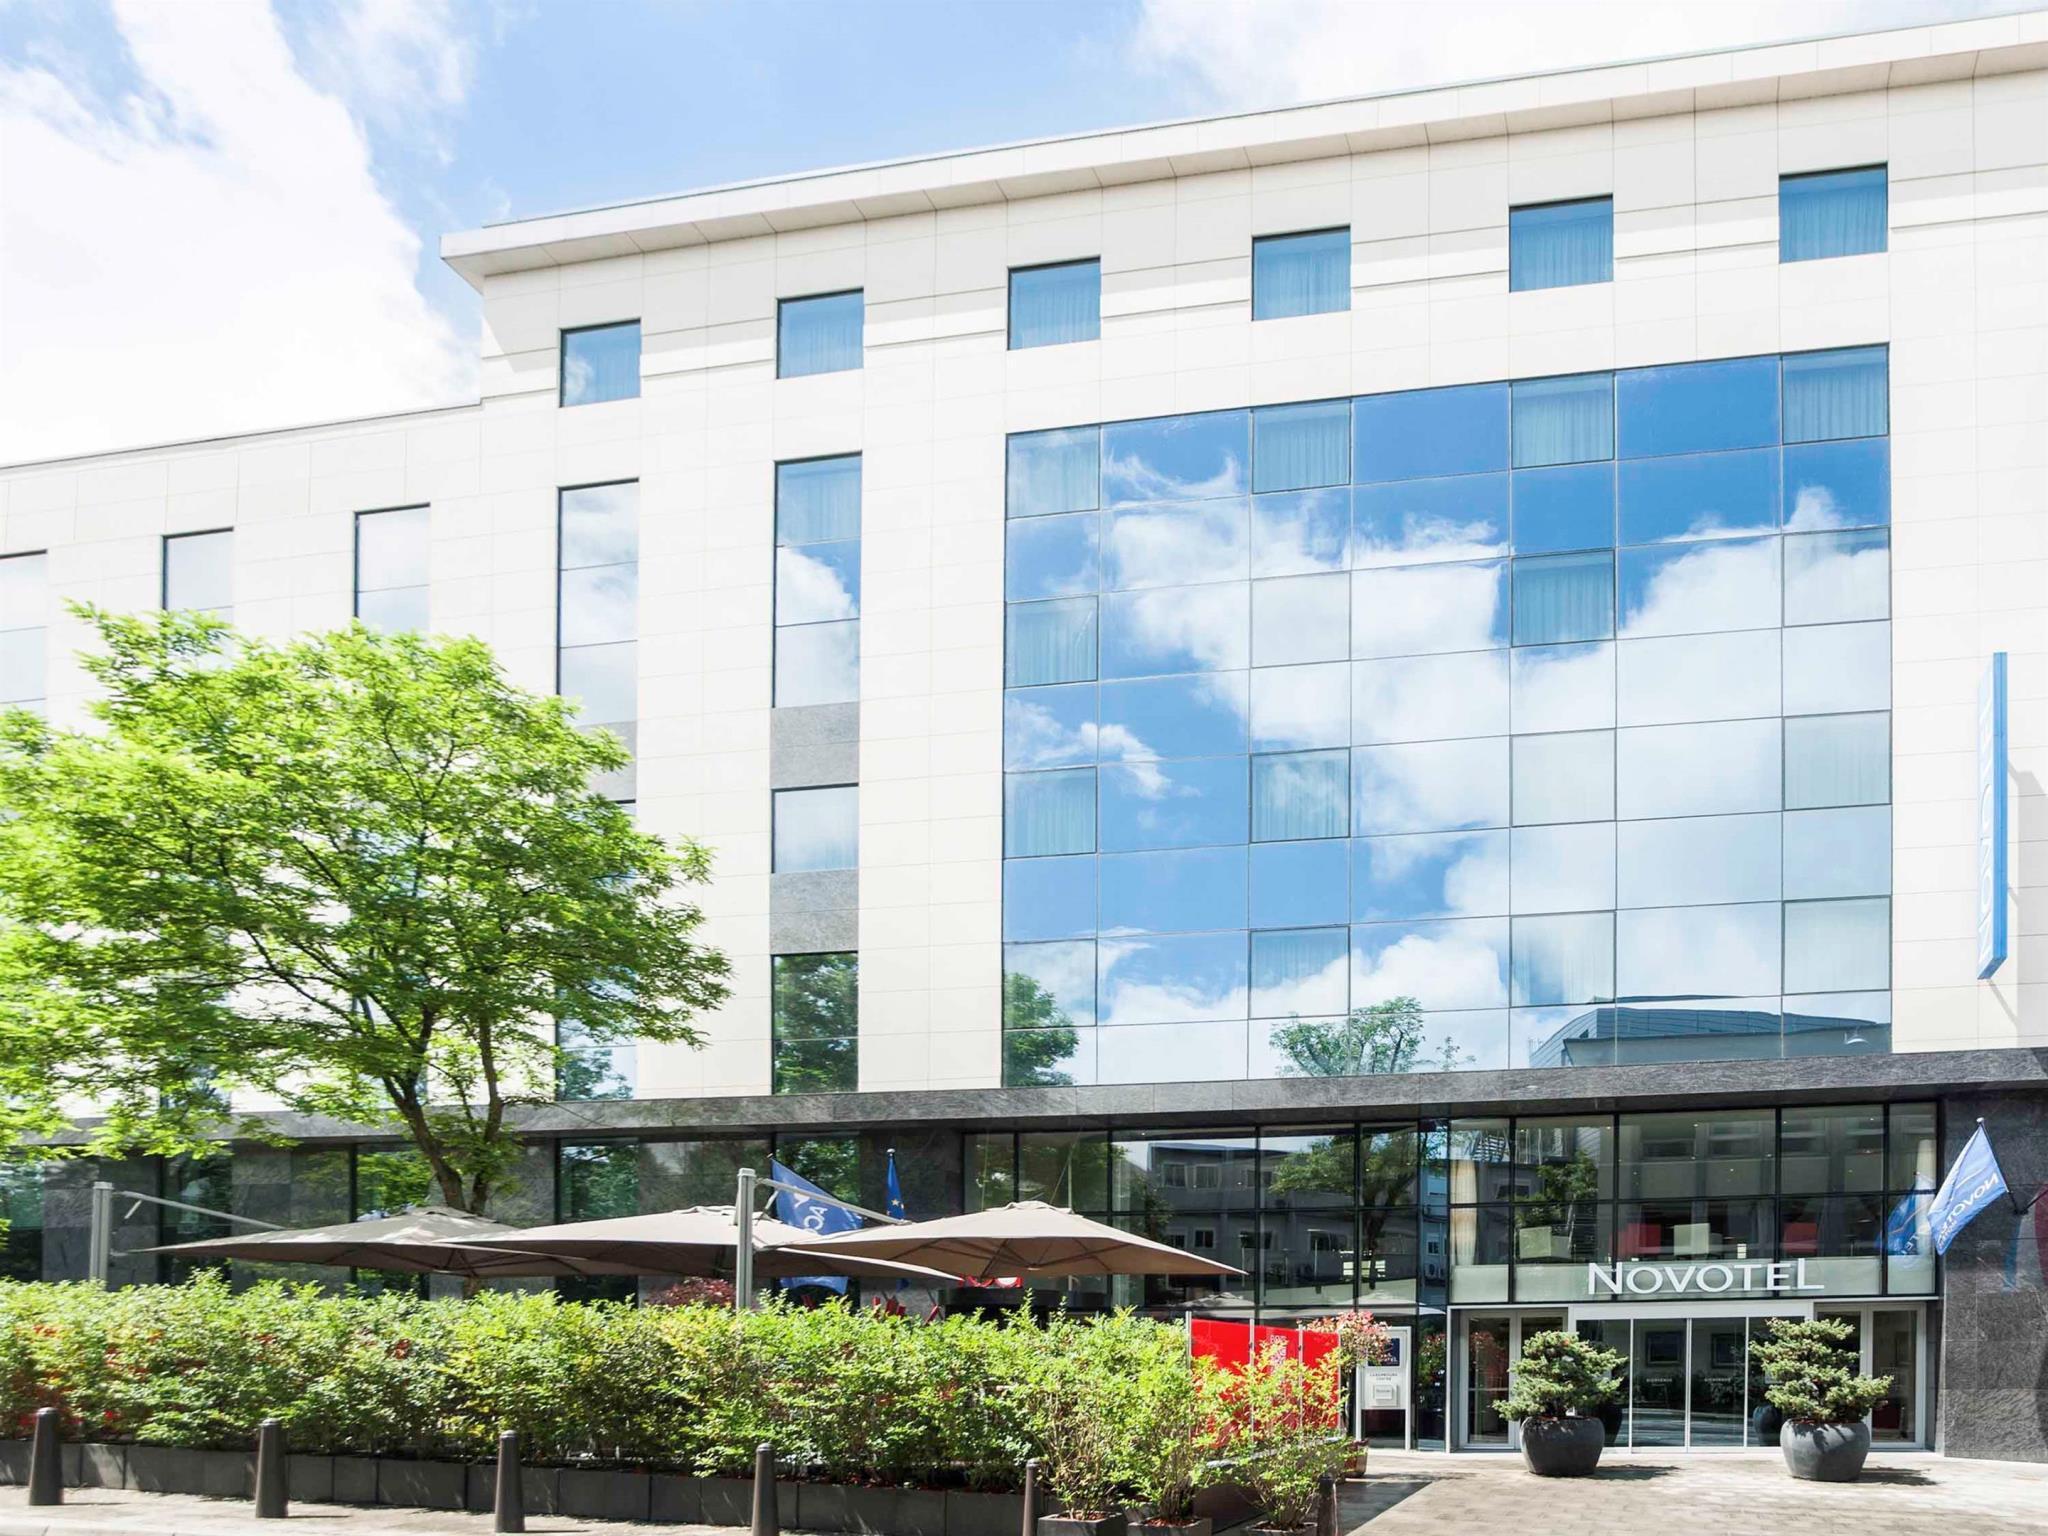 Novotel Luxembourg Centre Hotel